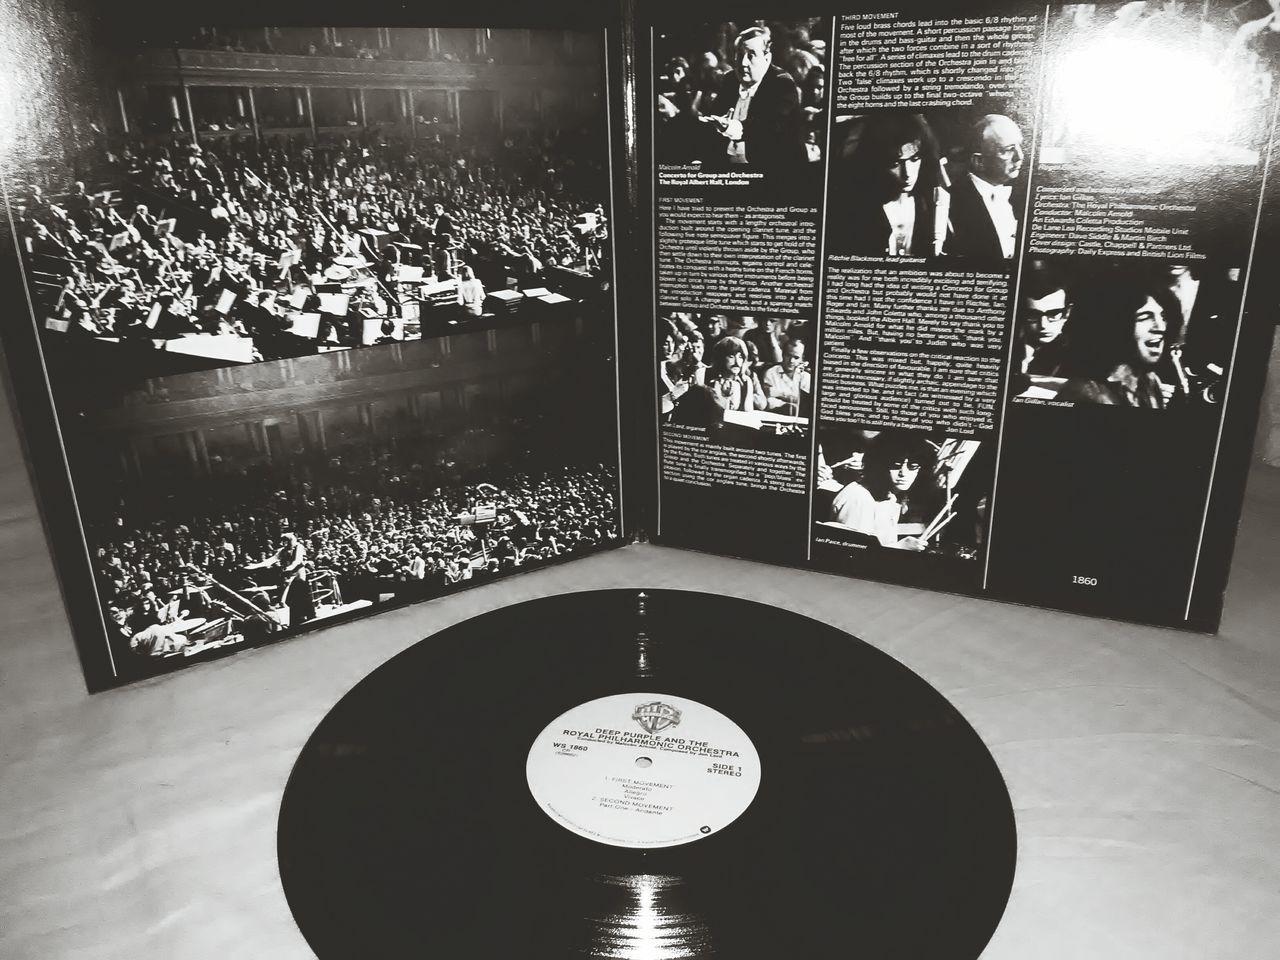 Deep Purple Vinyl Vinyl Records Vinylcollector Vinyllover Monochrome Blackandwhite Rocking Out Rock LiveMusic